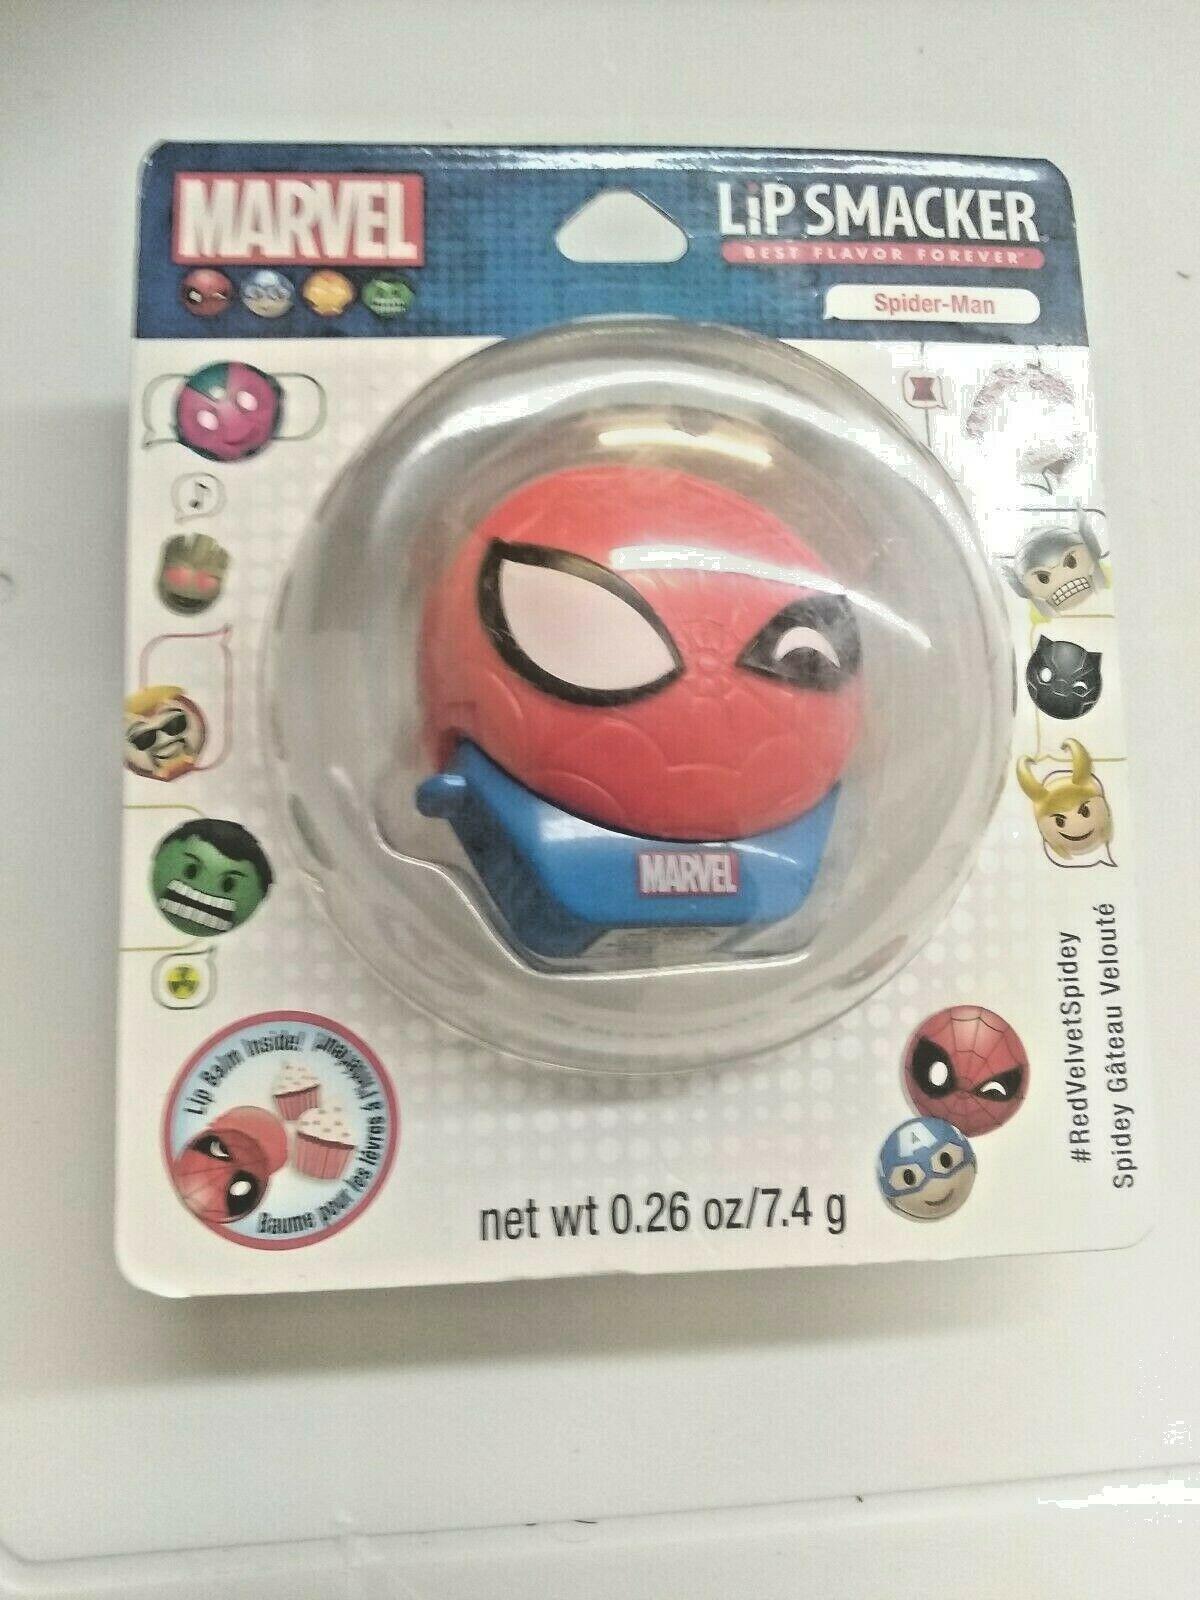 Lip Smacker Spider-Man Spider Stocking Stuffer Marvel 1410482